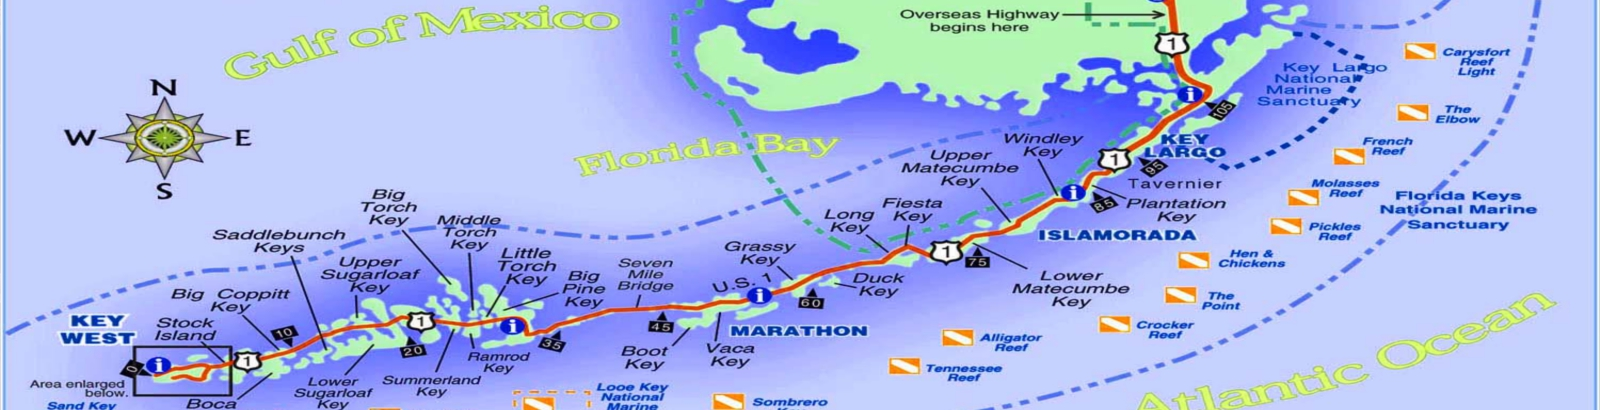 Florida Keys Map - Florida Keys Discounts & sFlorida ... on st. croix virgin islands map, sarasota keys map, key biscayne map, bahamas map, florida map, sw fl map, pa keys map, orlando map, state of fl map, port richey fl map, miami keys map, ft lauderdale map, key largo hotel map, key west map, home map, sunset key map, siesta key beach map, boca raton map, fl springs map, katrina map,